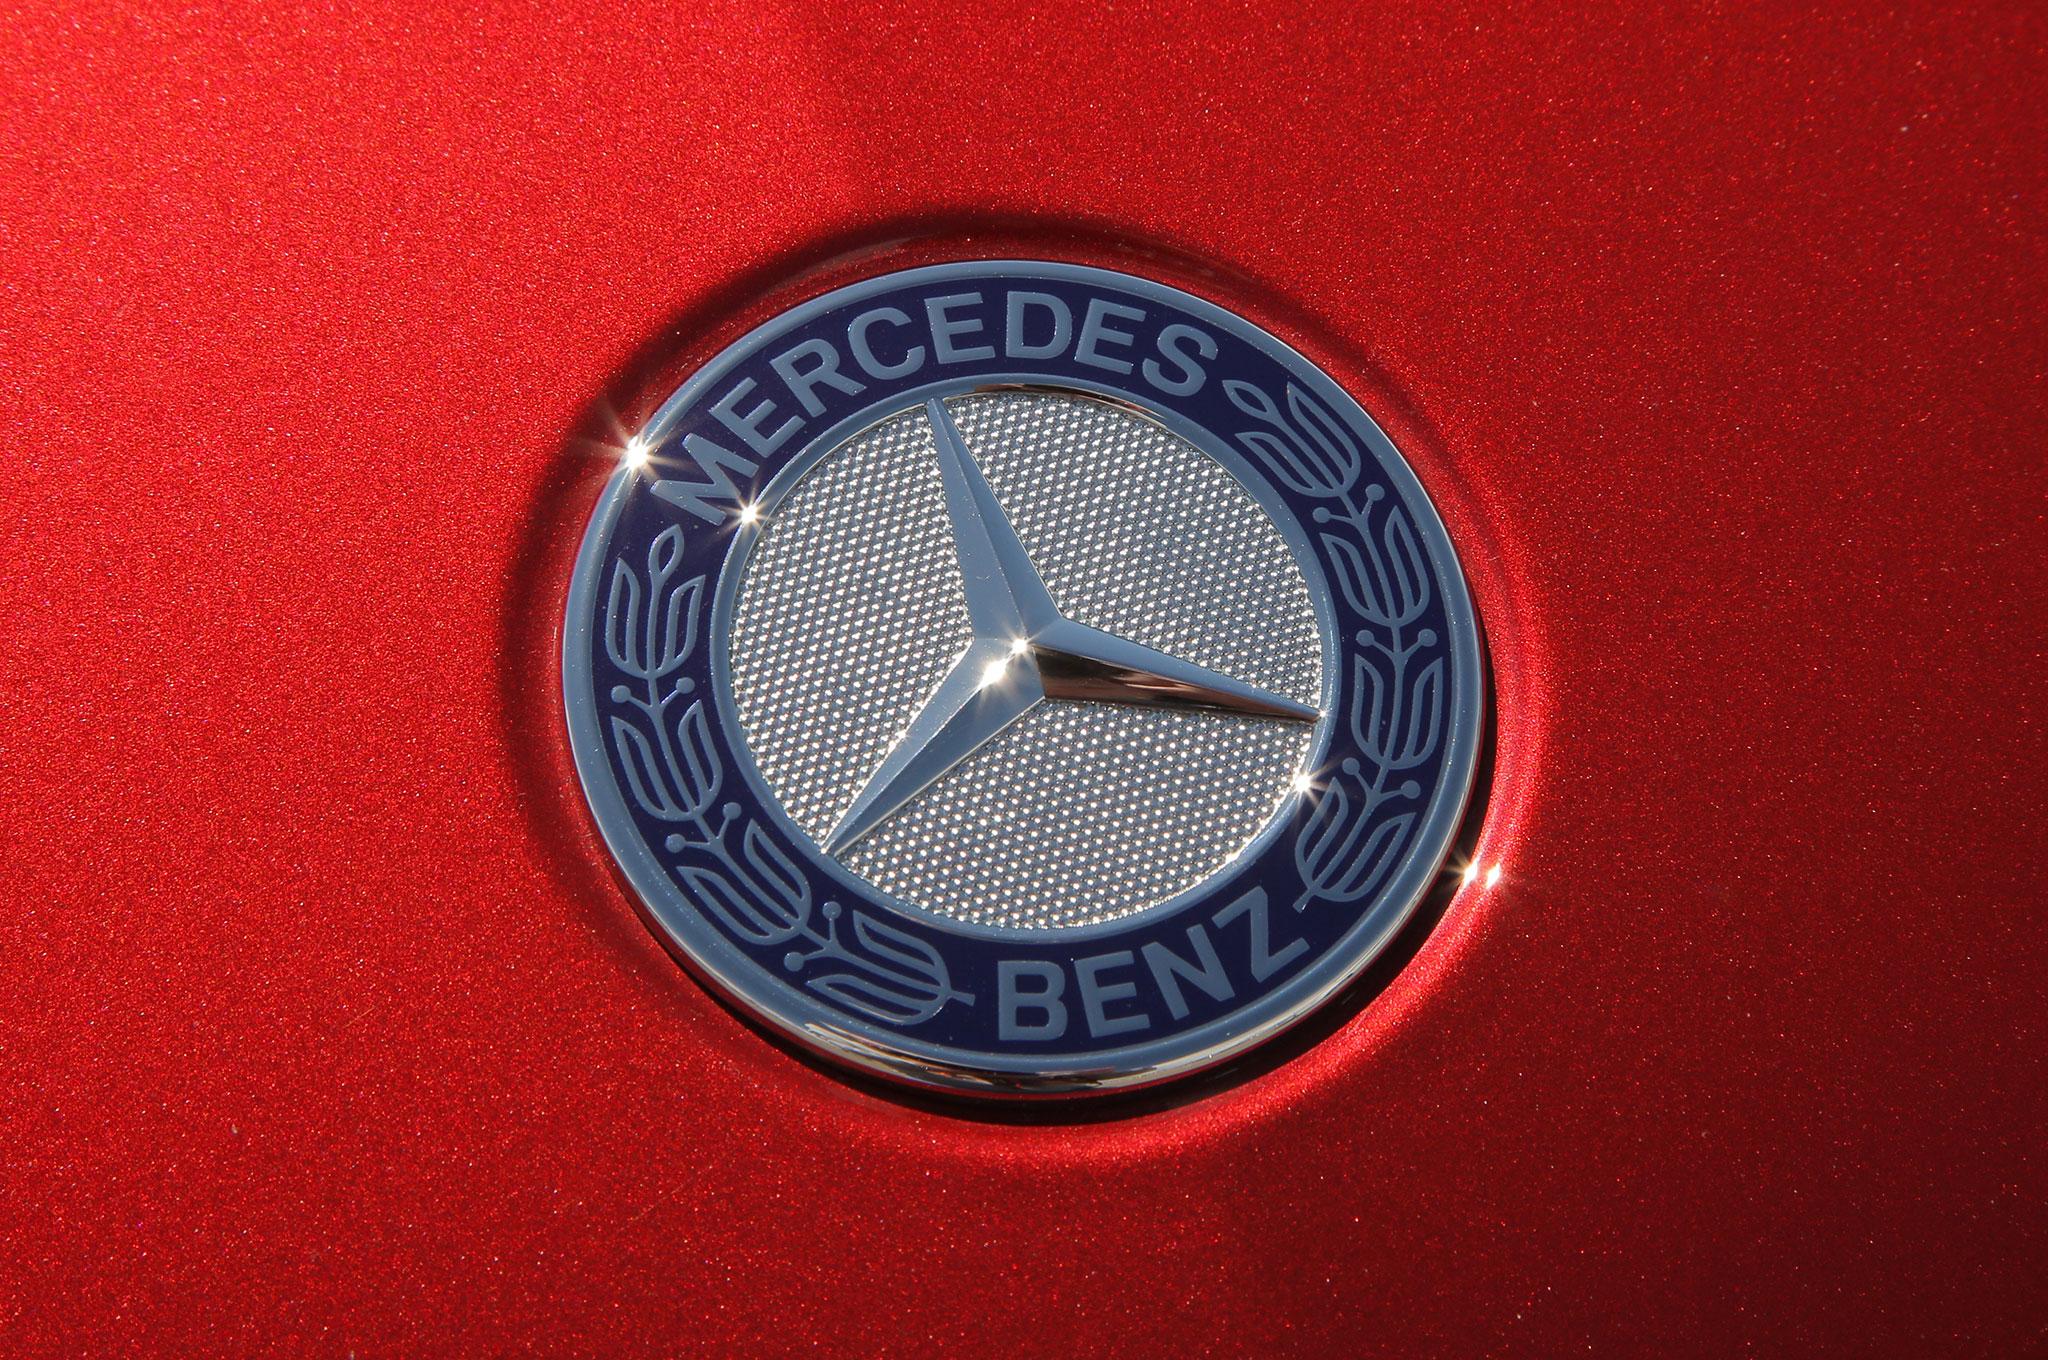 2017 mercedes benz gls class review for Mercedes benz badge